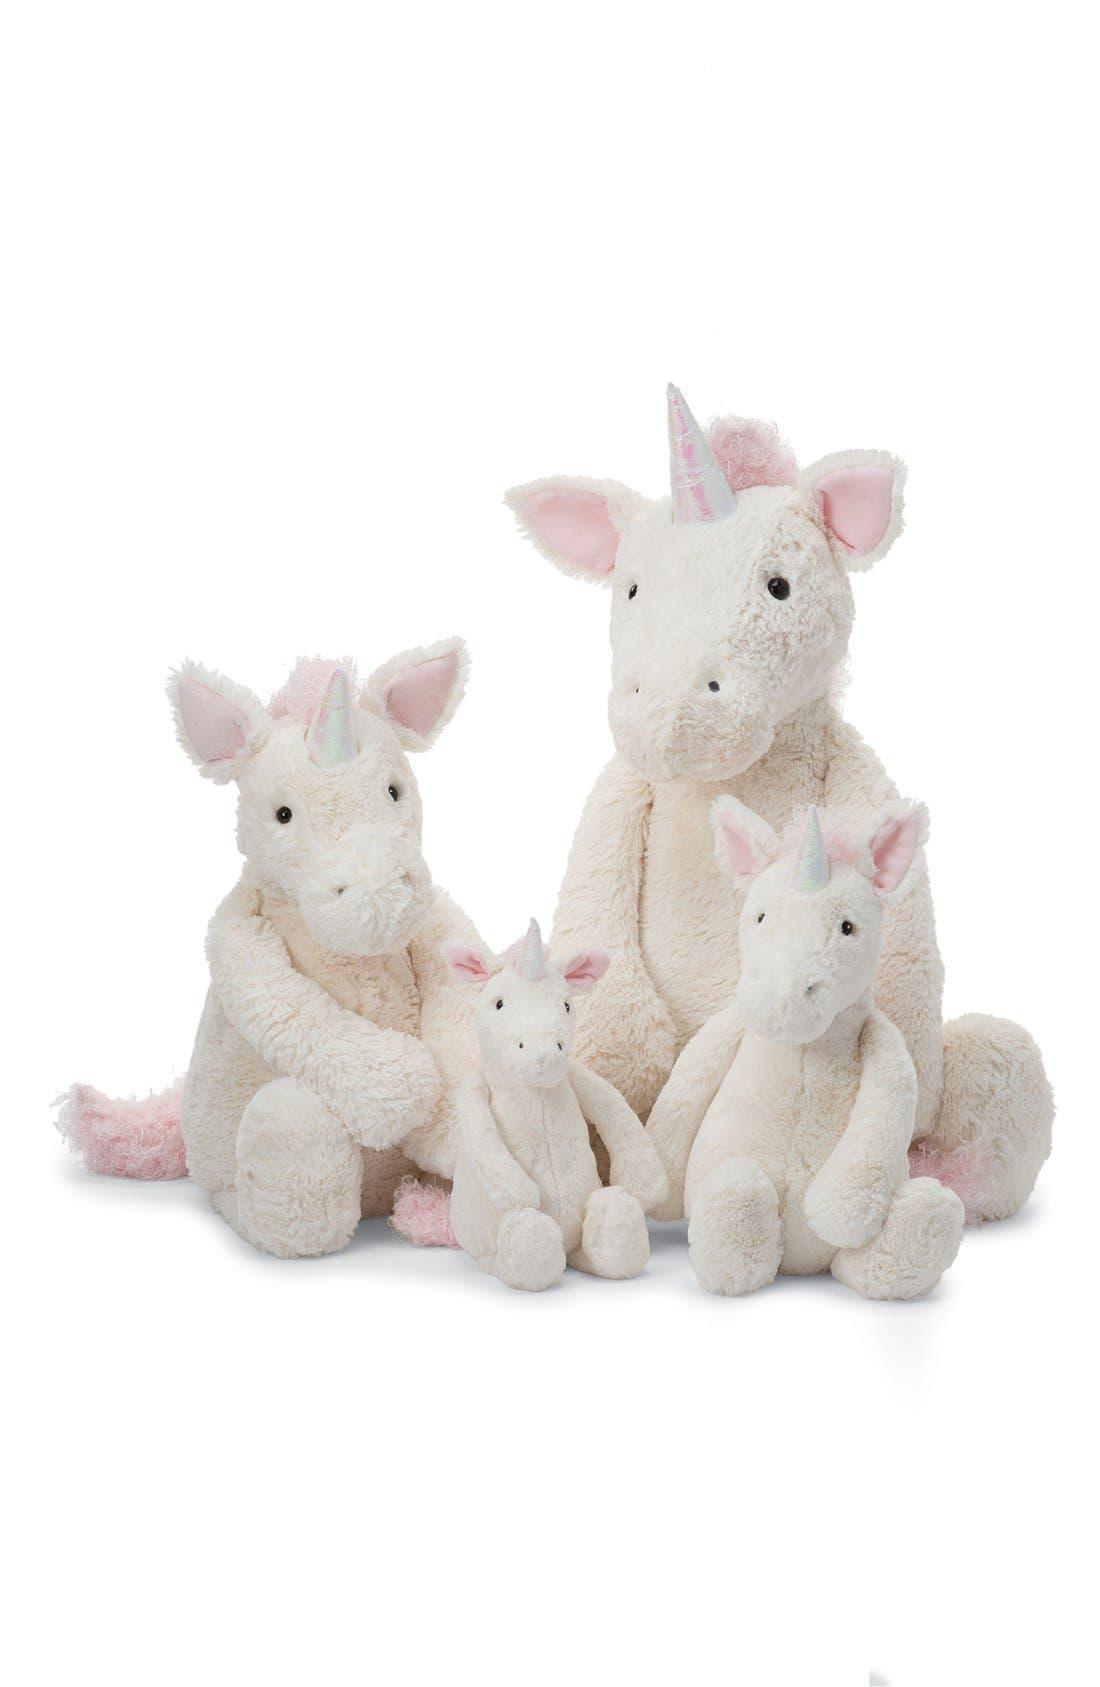 'Huge Bashful Unicorn' Stuffed Animal,                             Alternate thumbnail 3, color,                             CREAM